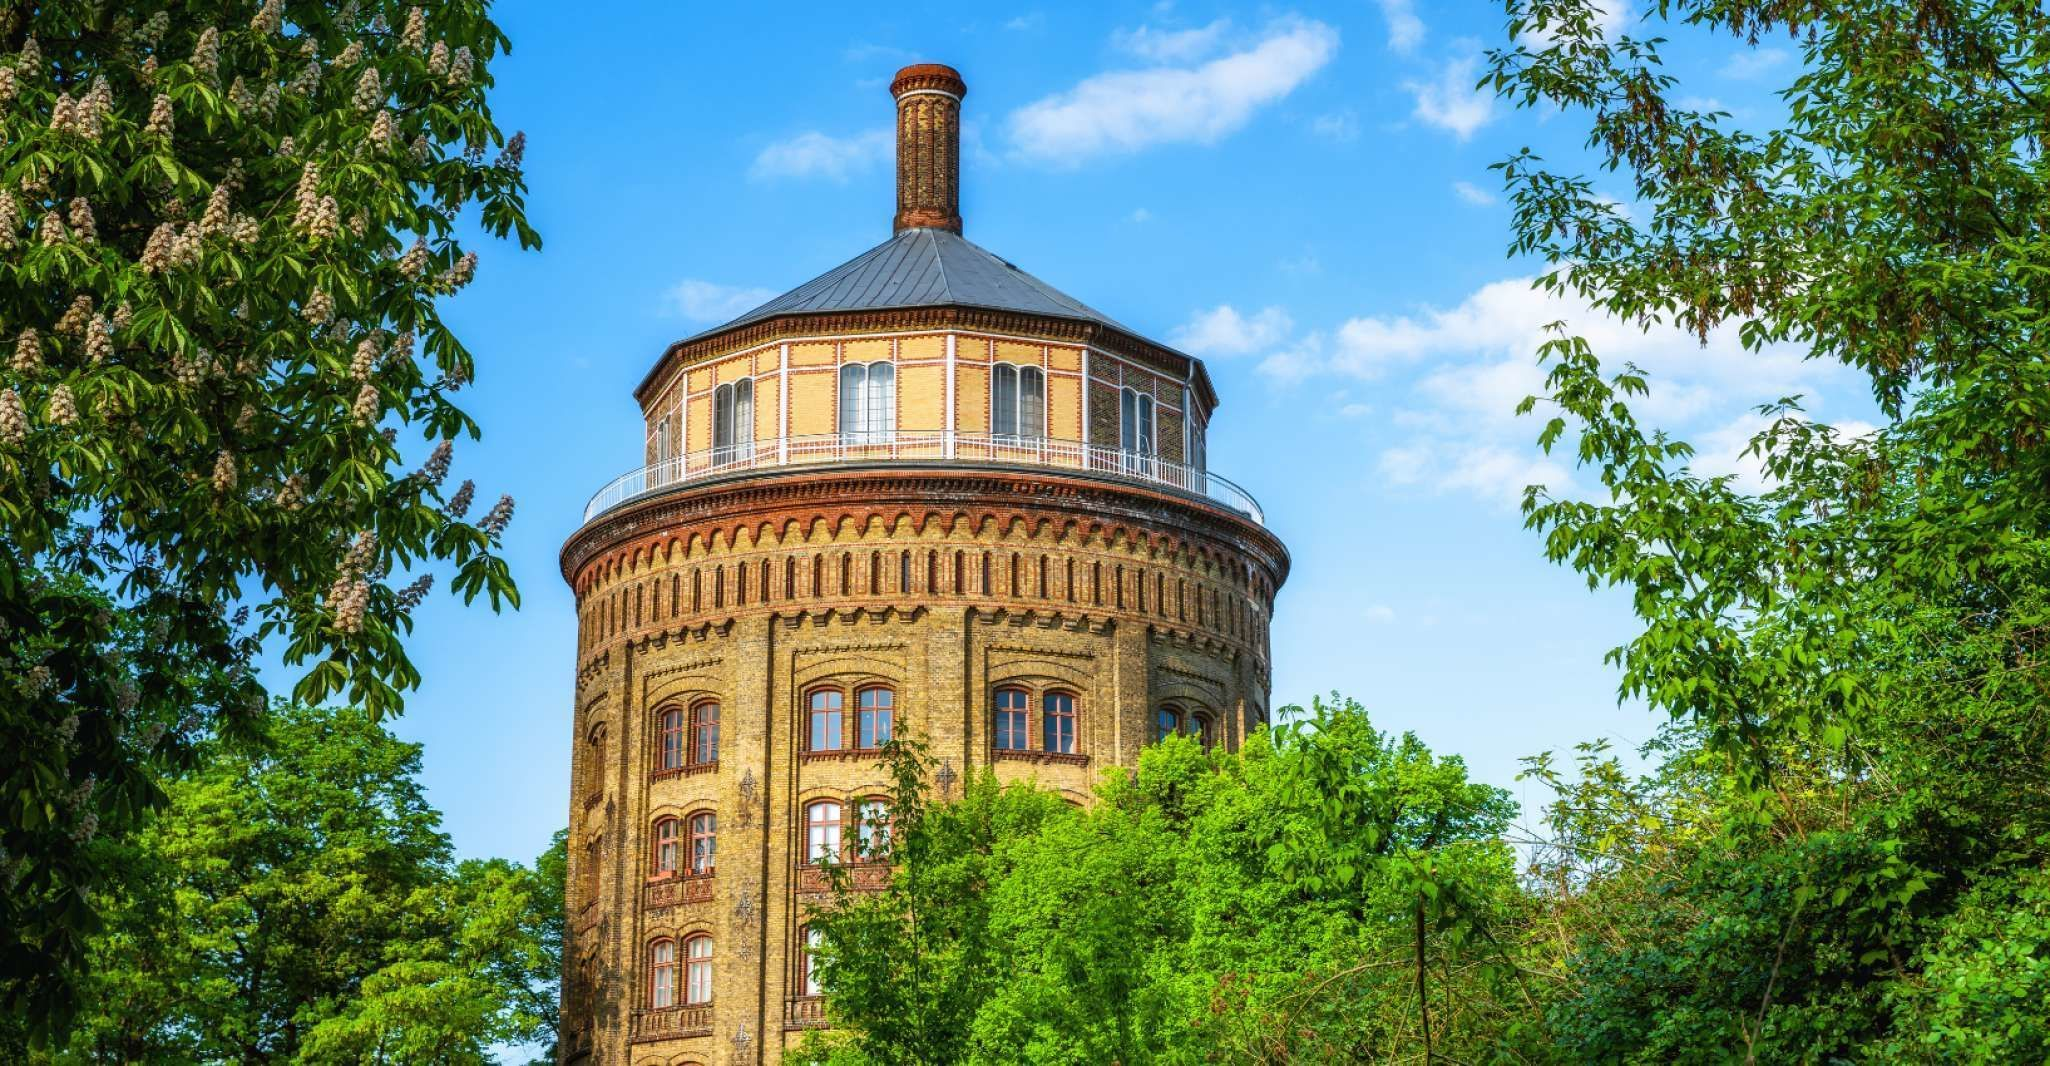 Berlin: City Game Tour of Prenzlauer Berg (in German)